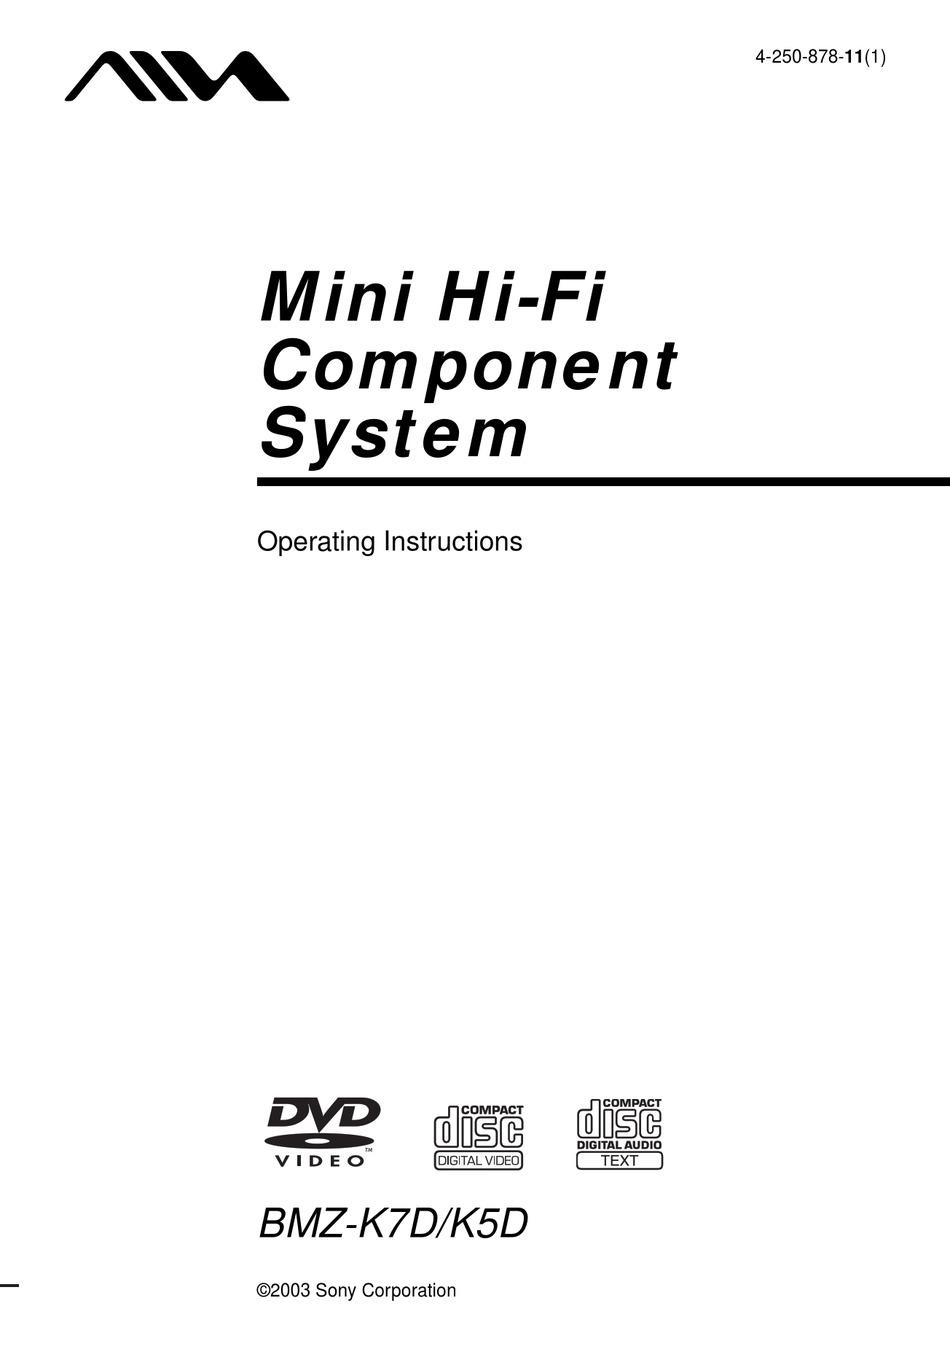 AIWA BMZ-K5D OPERATING INSTRUCTIONS MANUAL Pdf Download